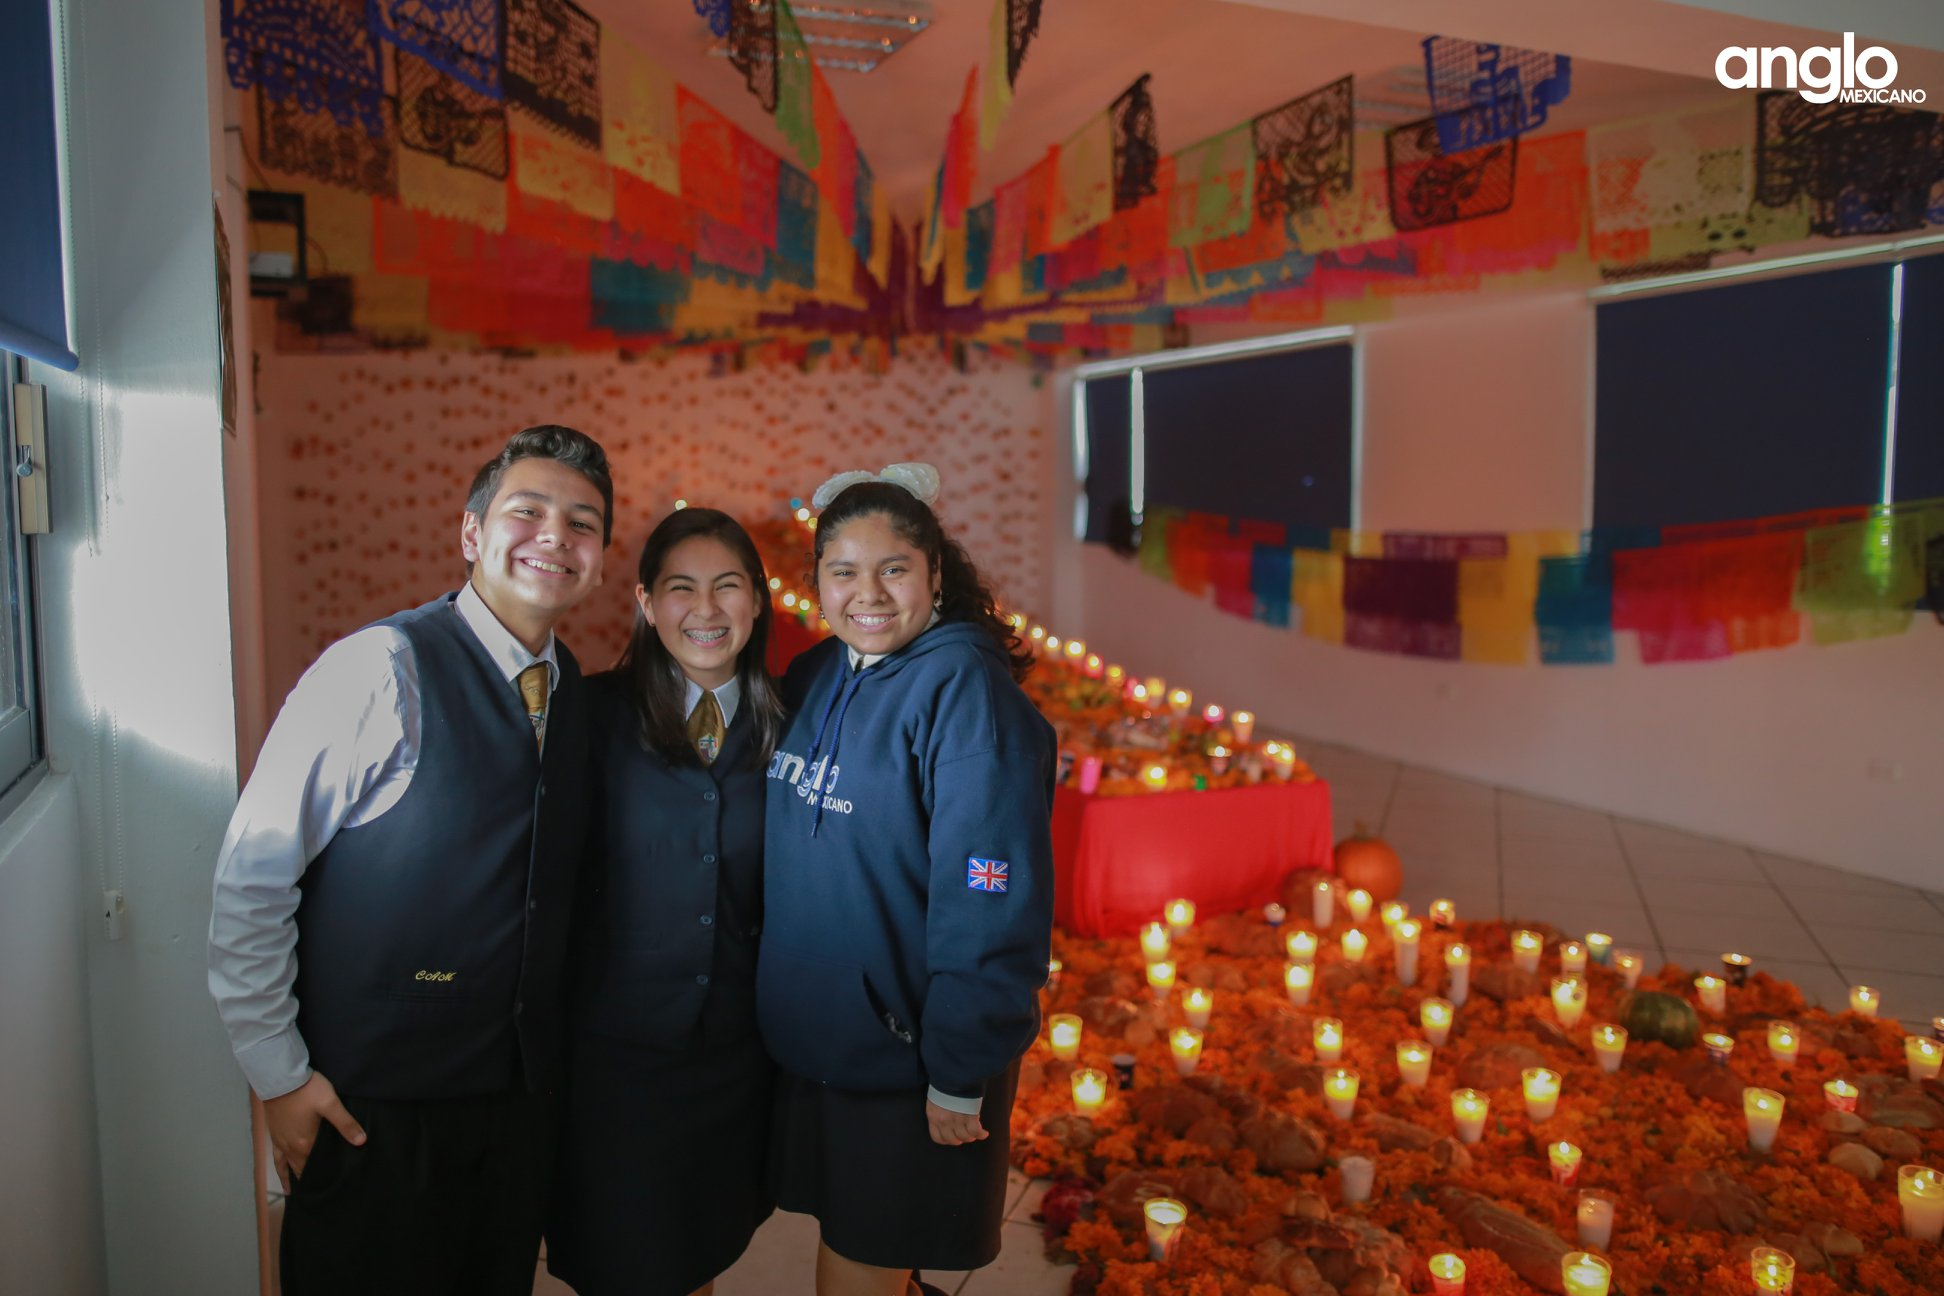 ANGLO MEXICANO DE COATZACOALCOS-VISITA-ALTARES-017